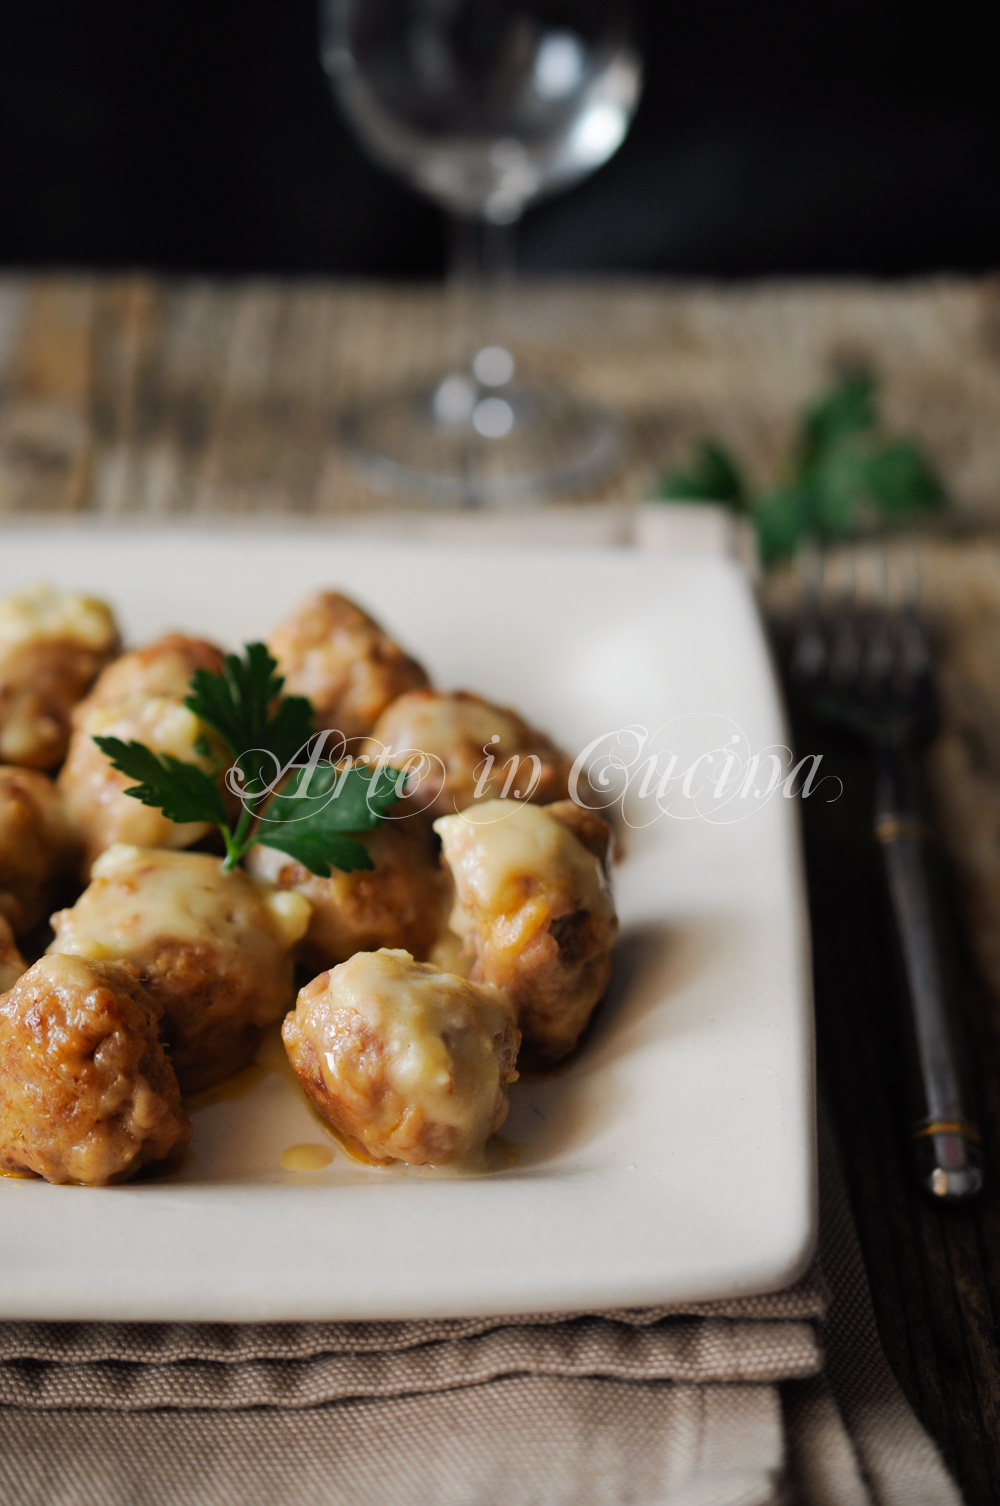 Polpette svedesi ikea kottbullar ricetta facile vickyart arte in cucina